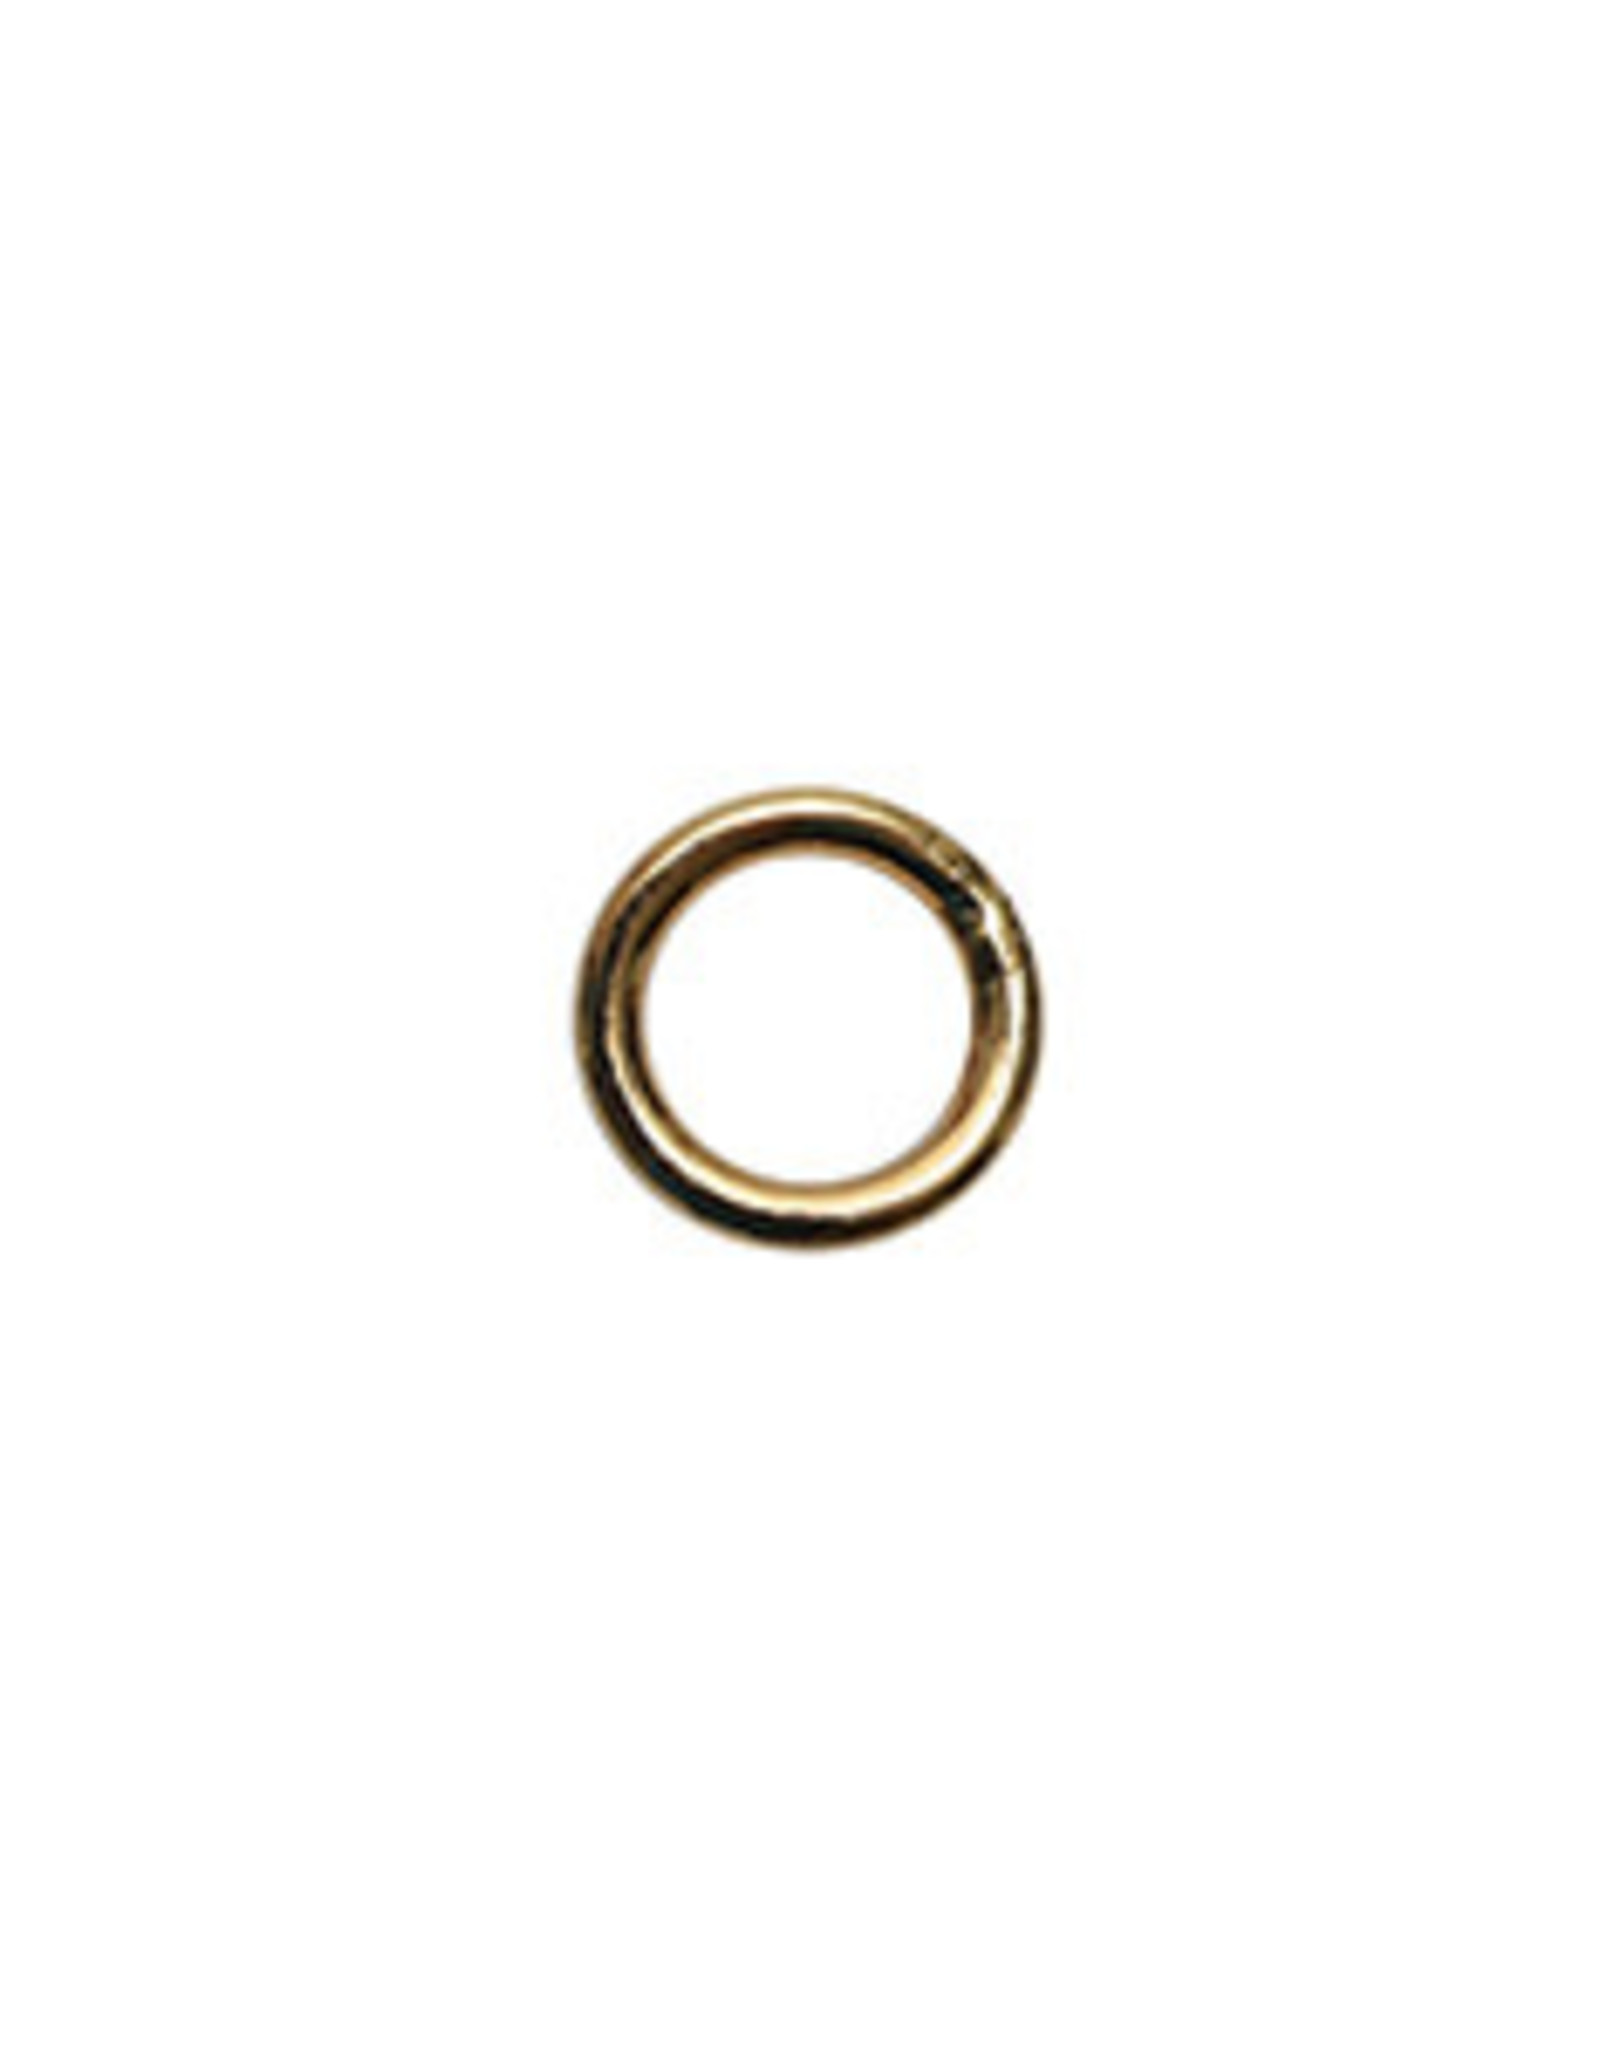 6mm Closed Ring 19ga Gold Plate Qty 24